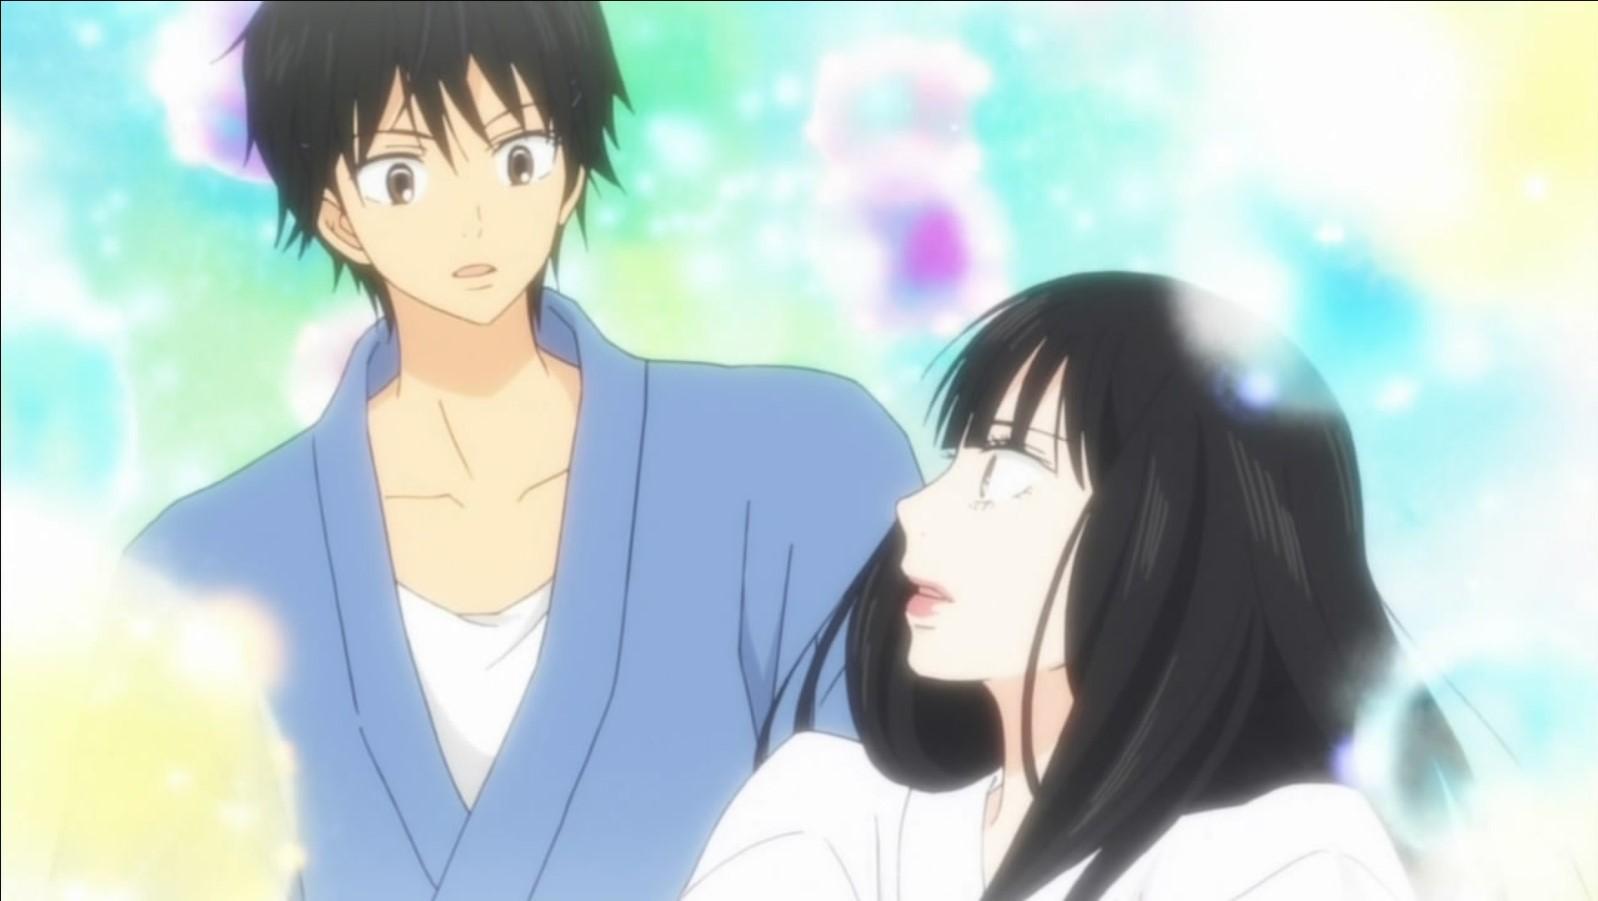 Anime like Horimiya- Kimi no Todoke